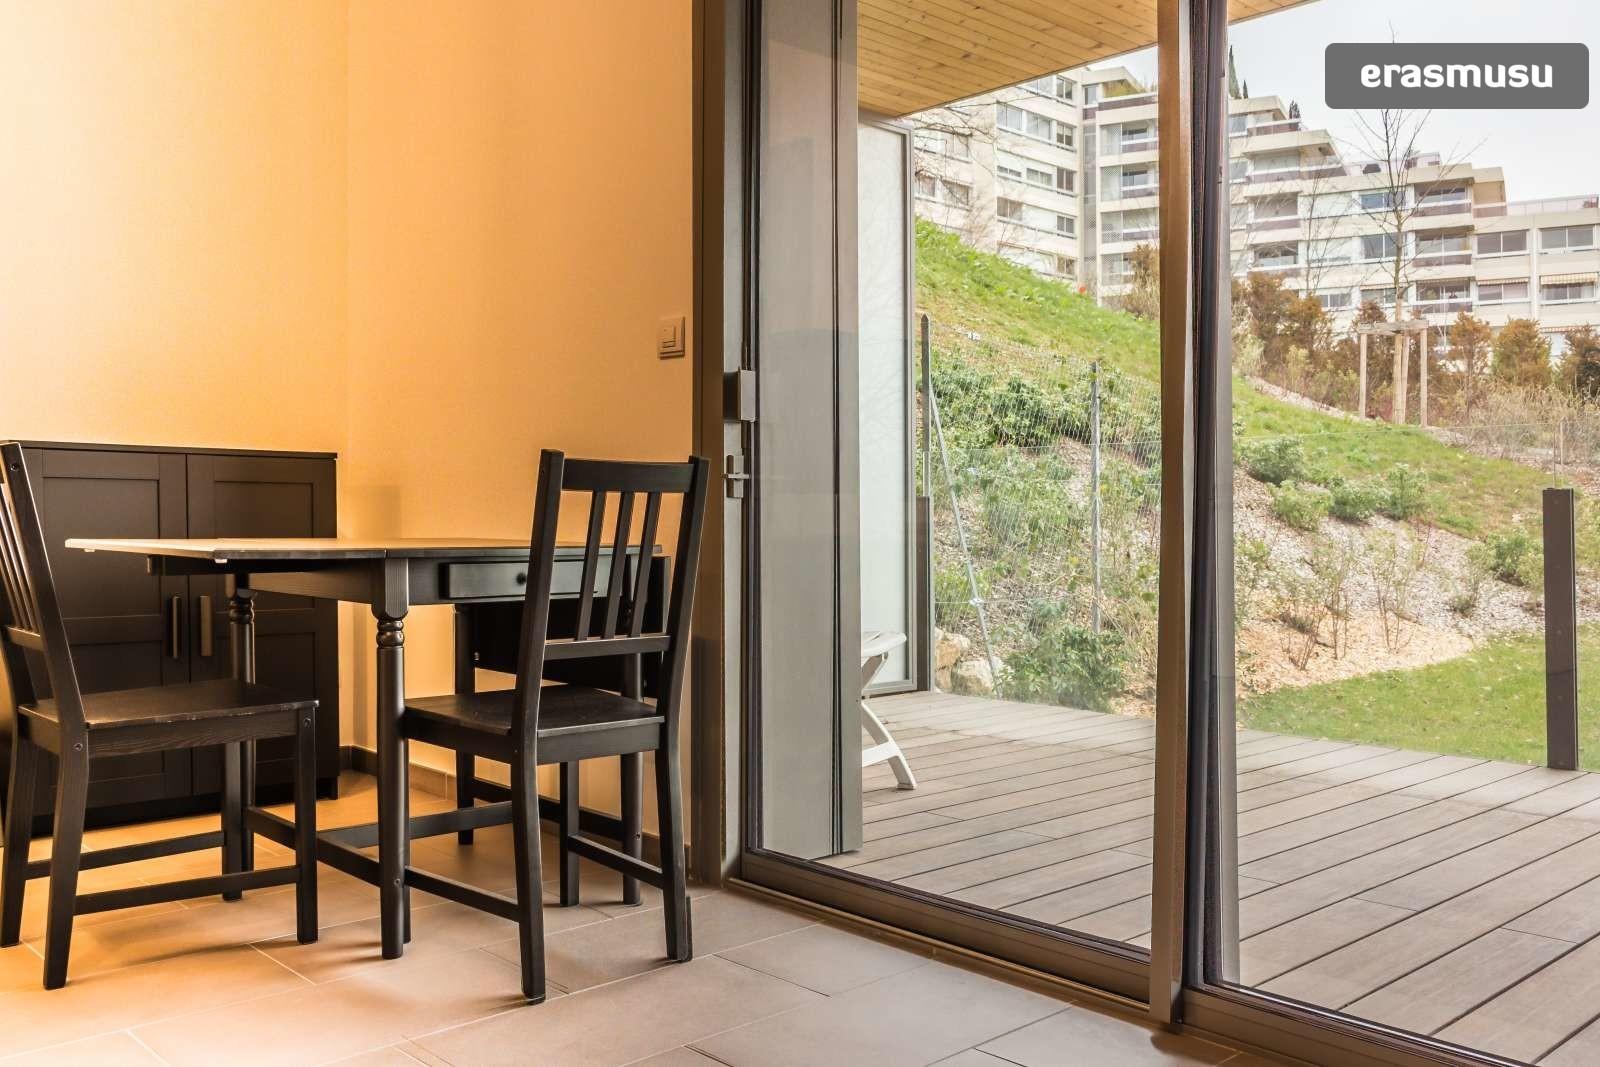 stylish-secure-studio-terrace-fourviere-hill-lyon-278f5c8bf26d12